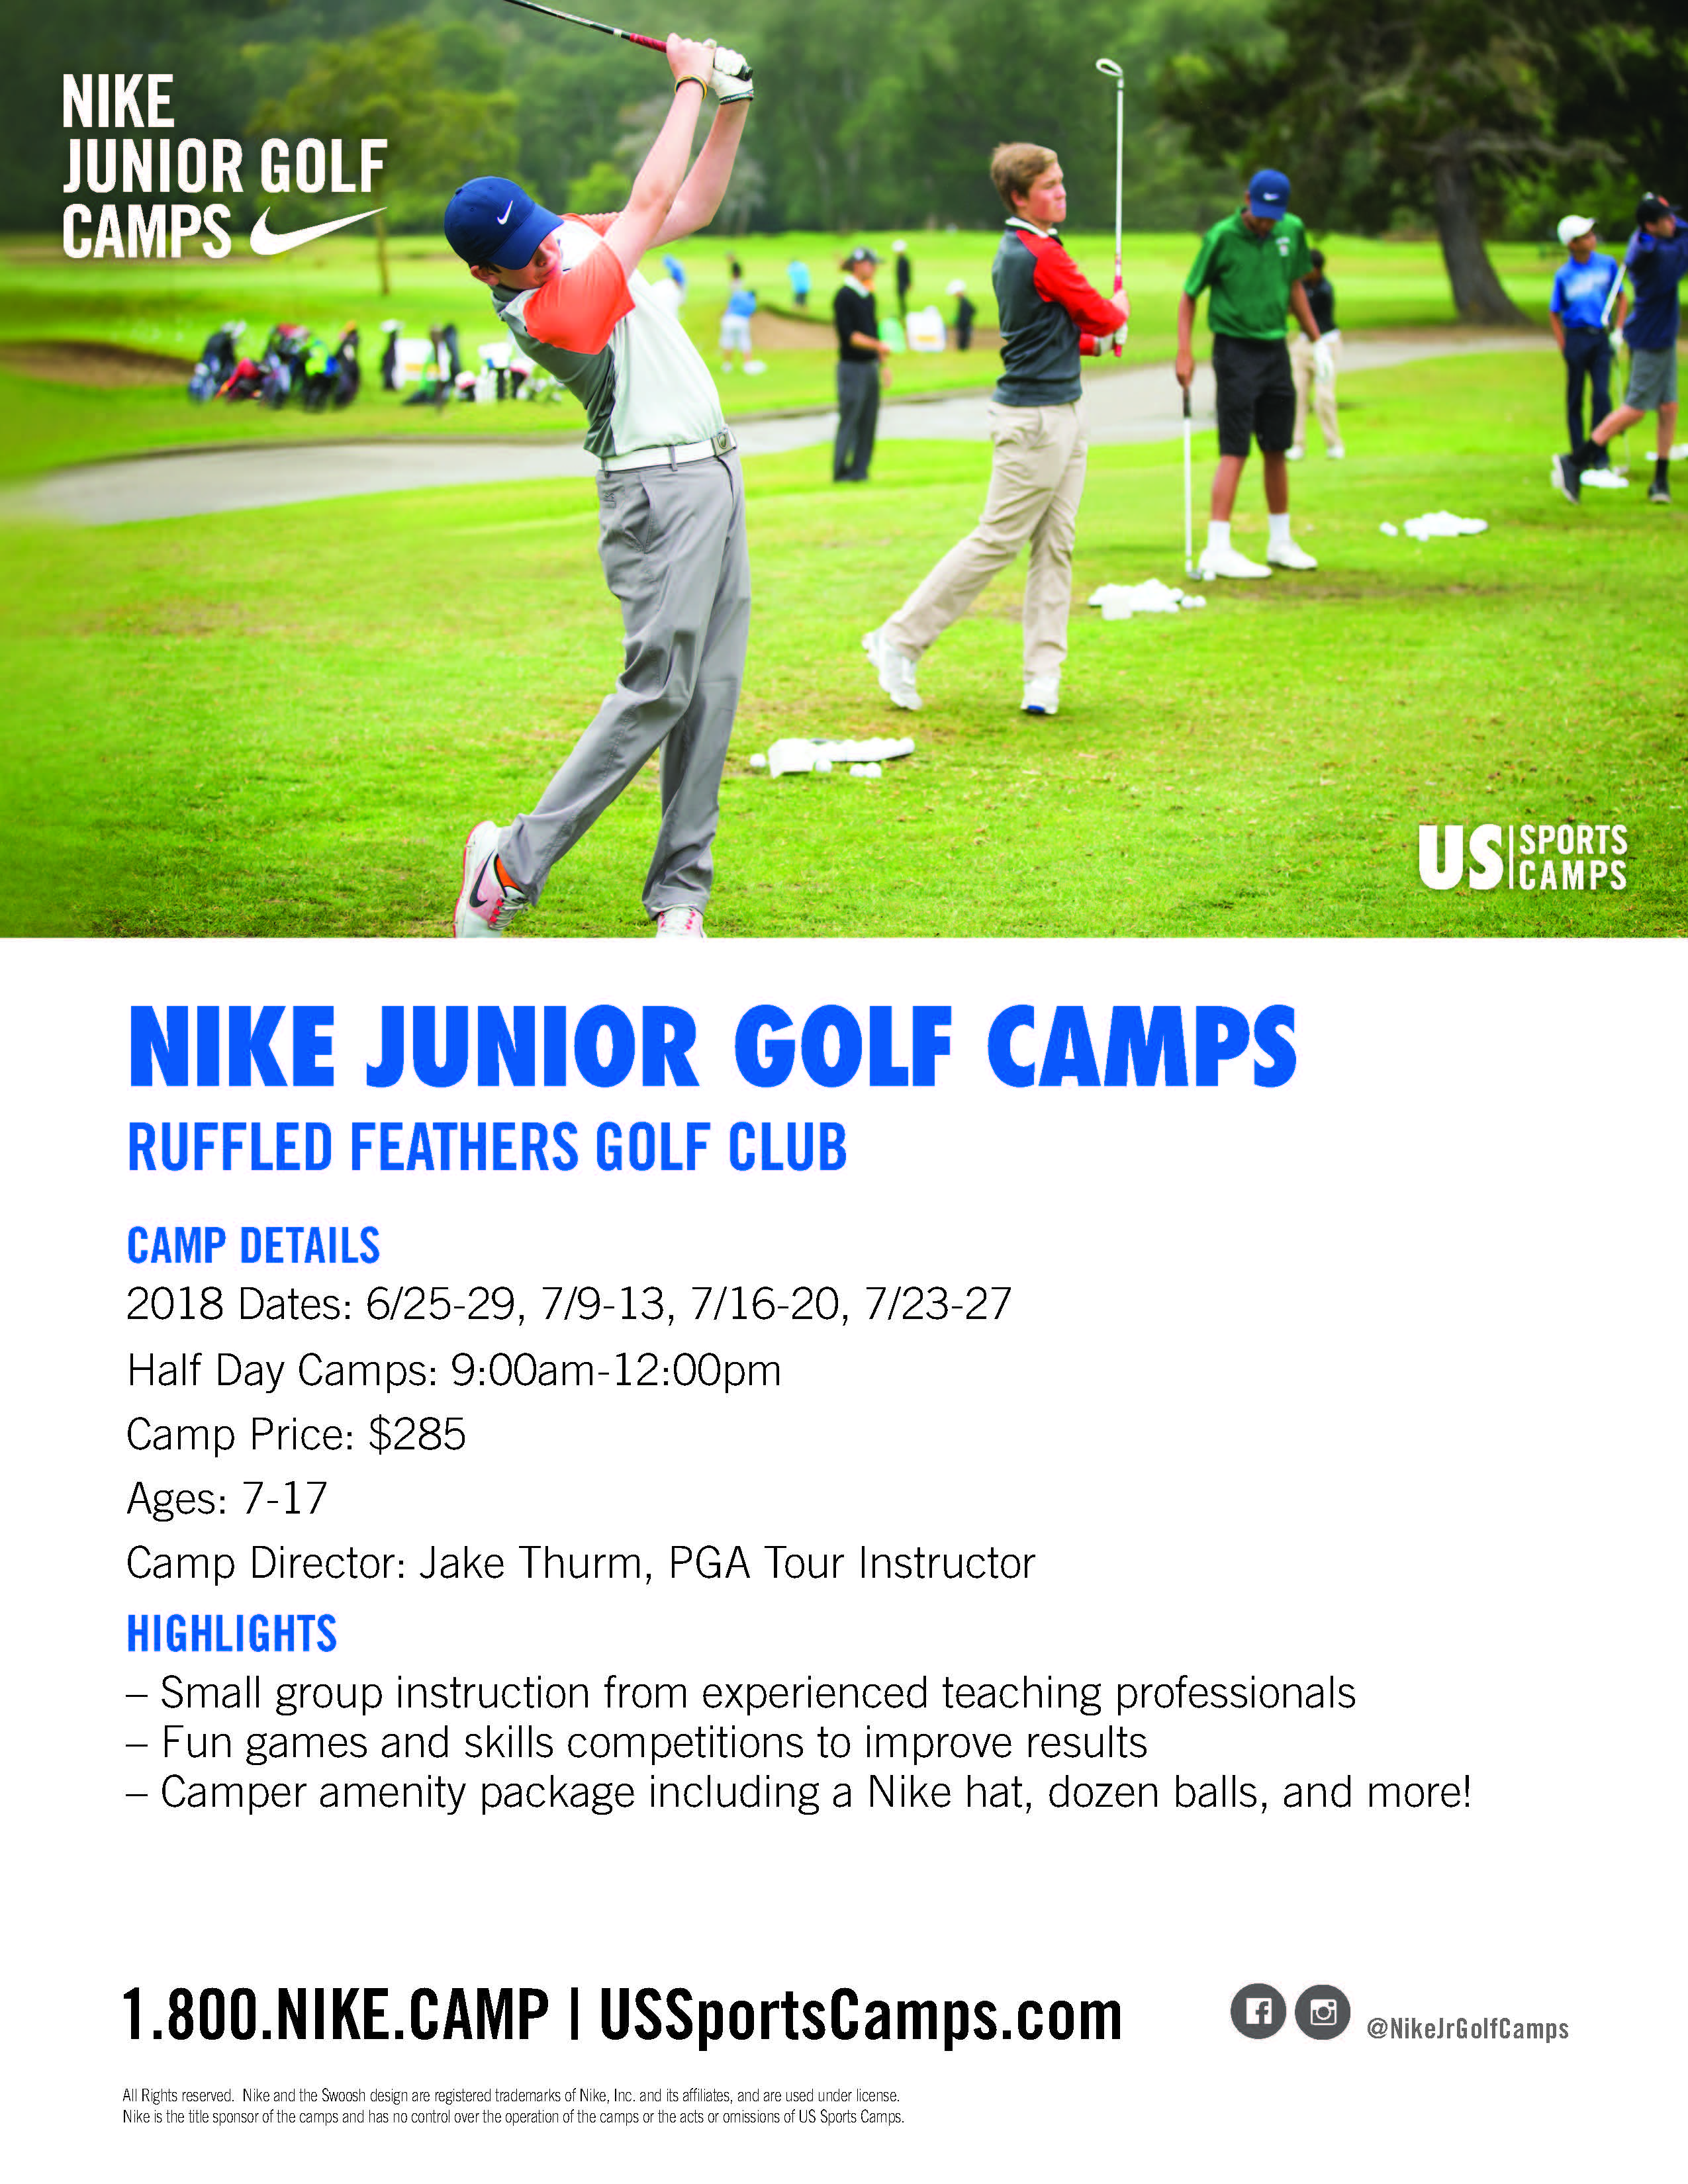 Nike JR golf camp flyer